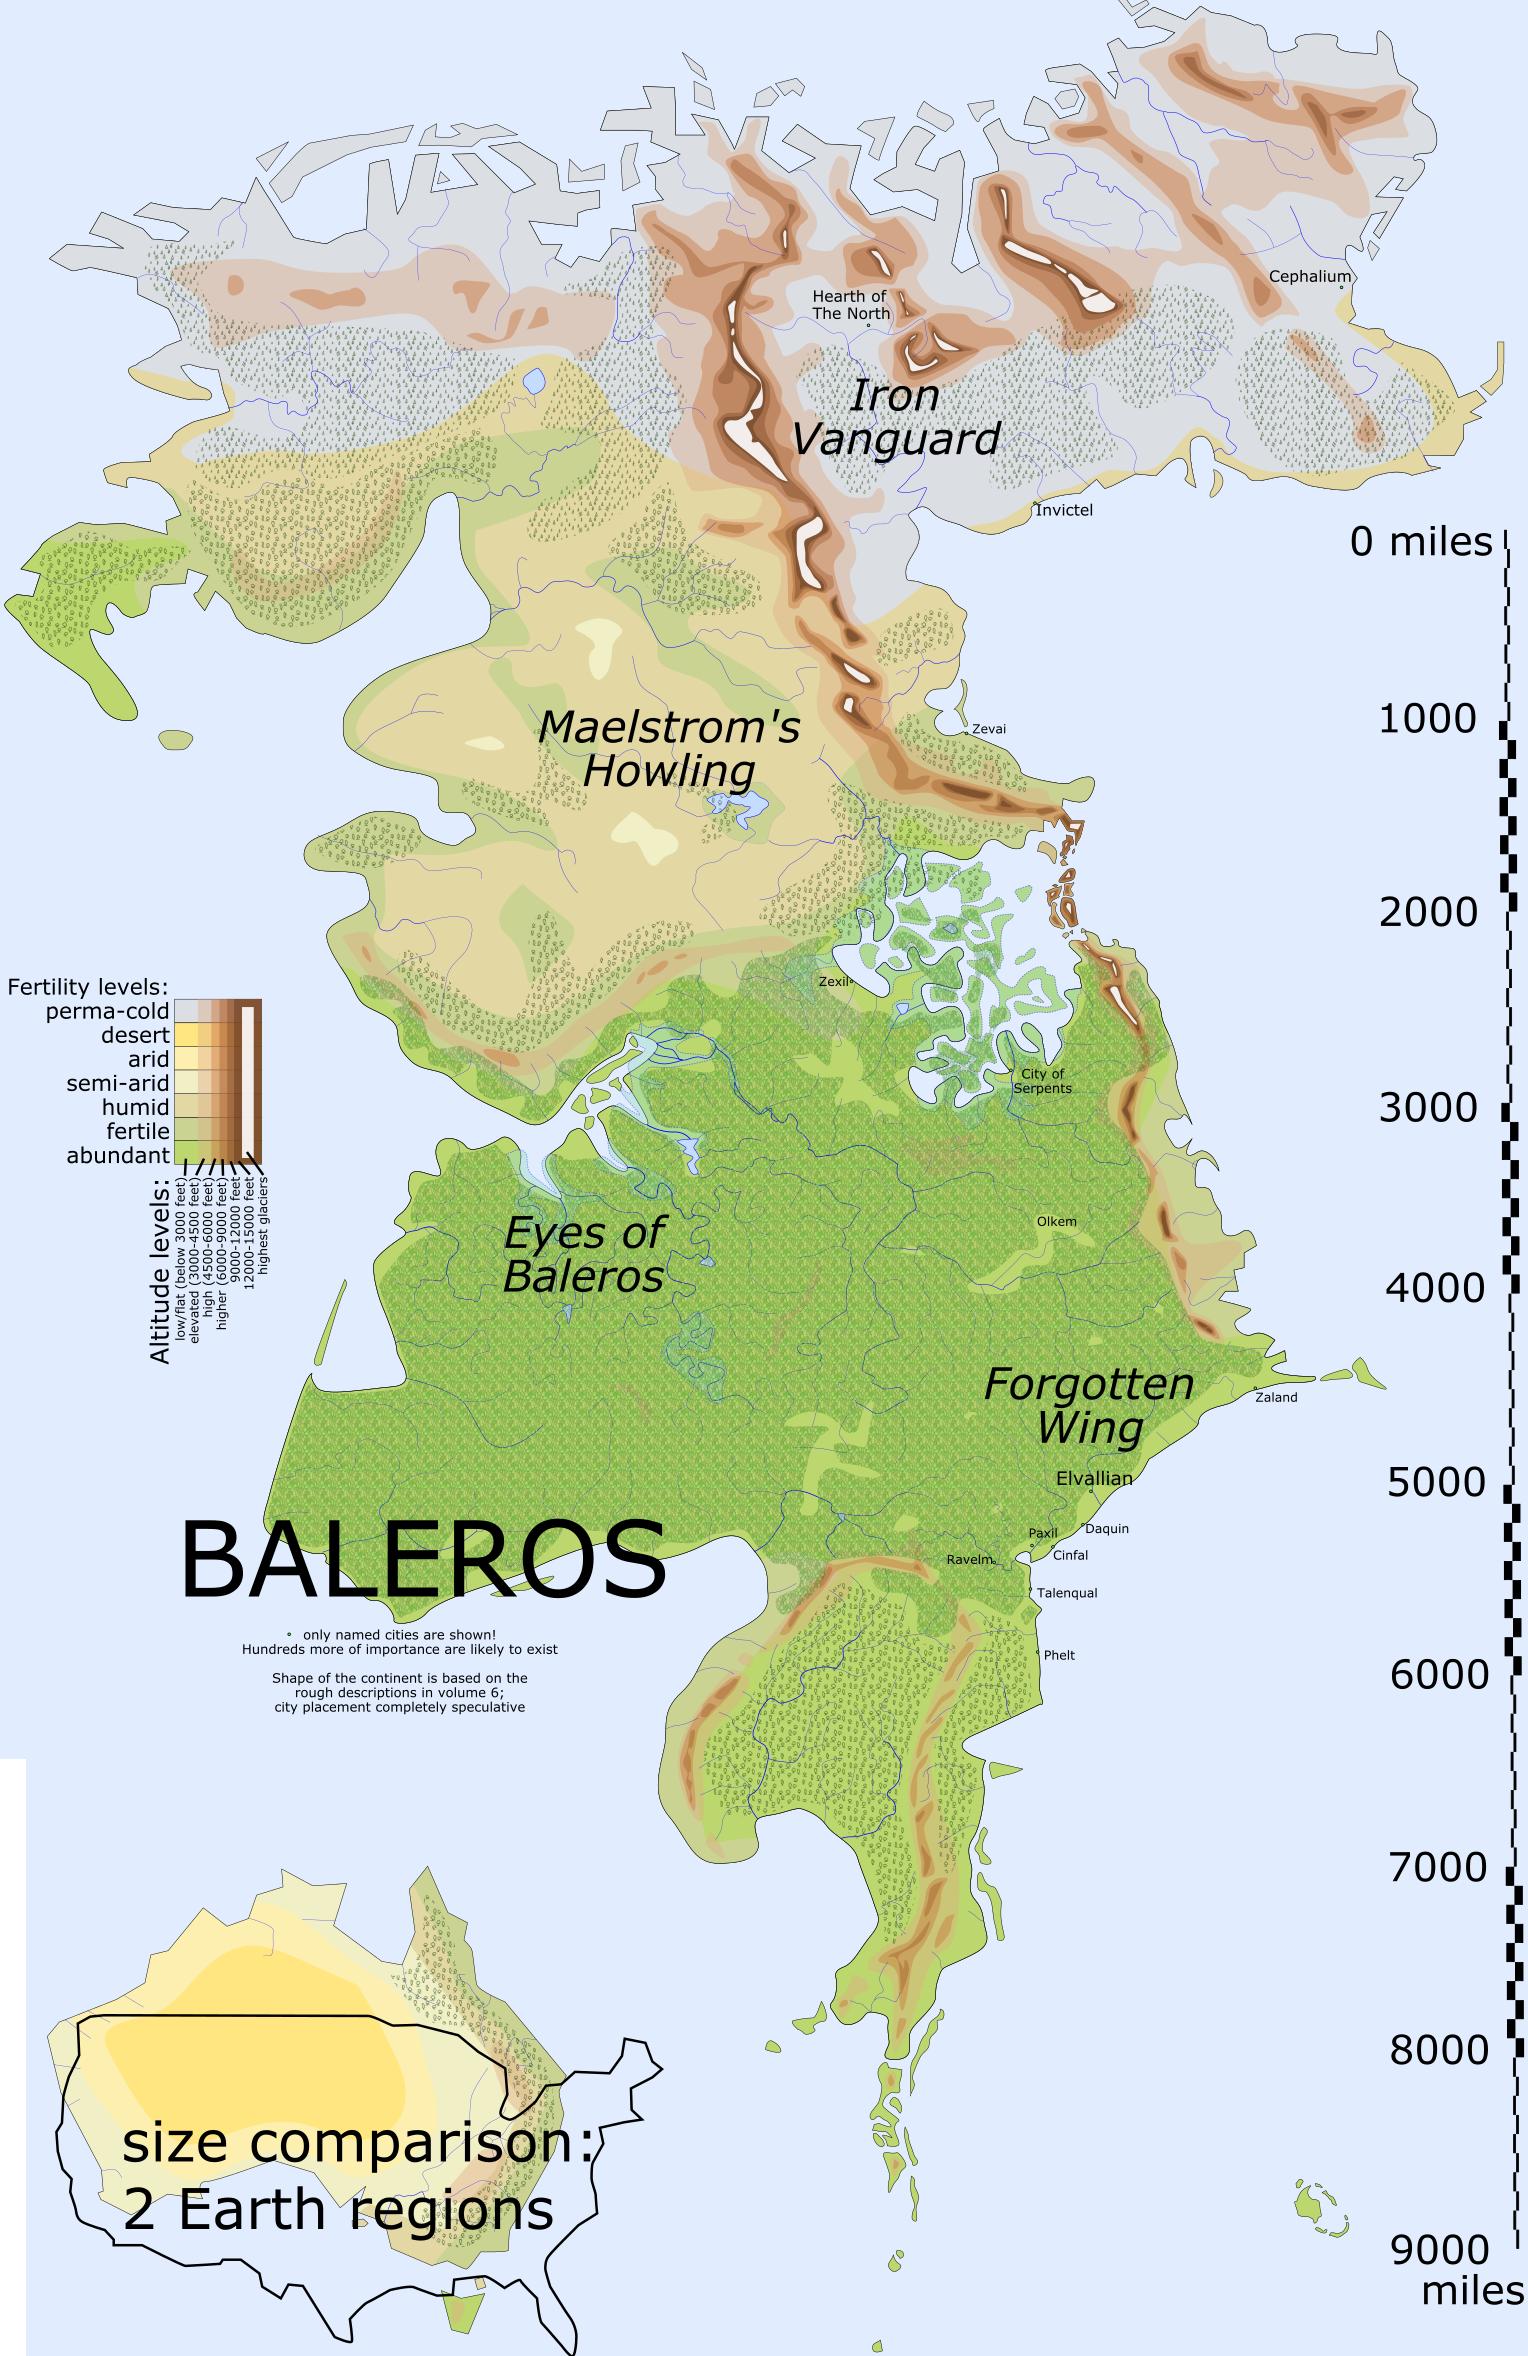 Baleros